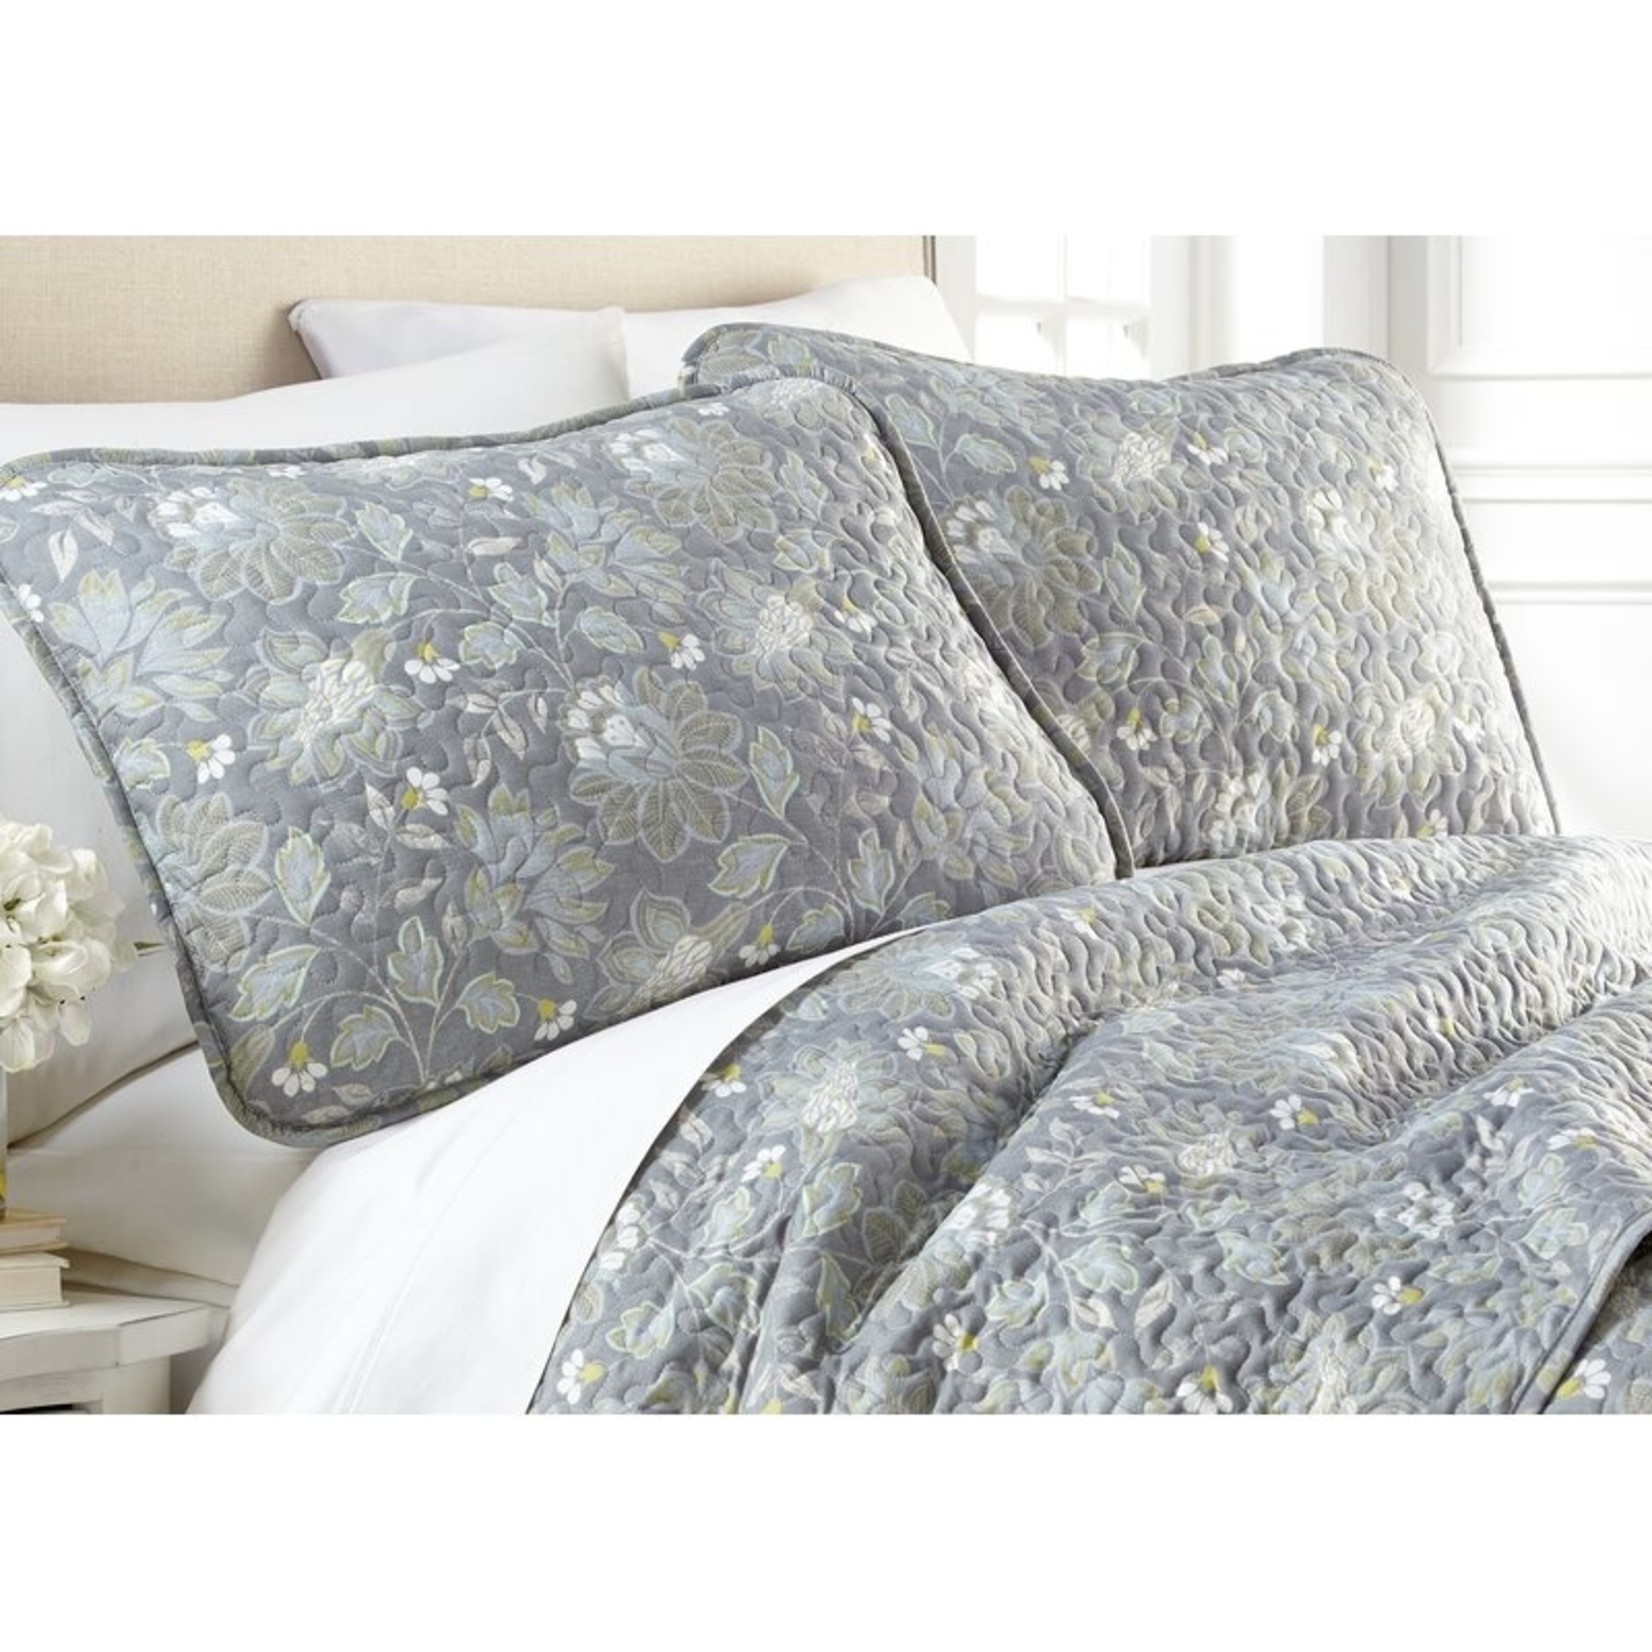 *King/Cal King - Stony Creek Infinite Blossom Lightweight Reversible Quilt Set - Final Sale